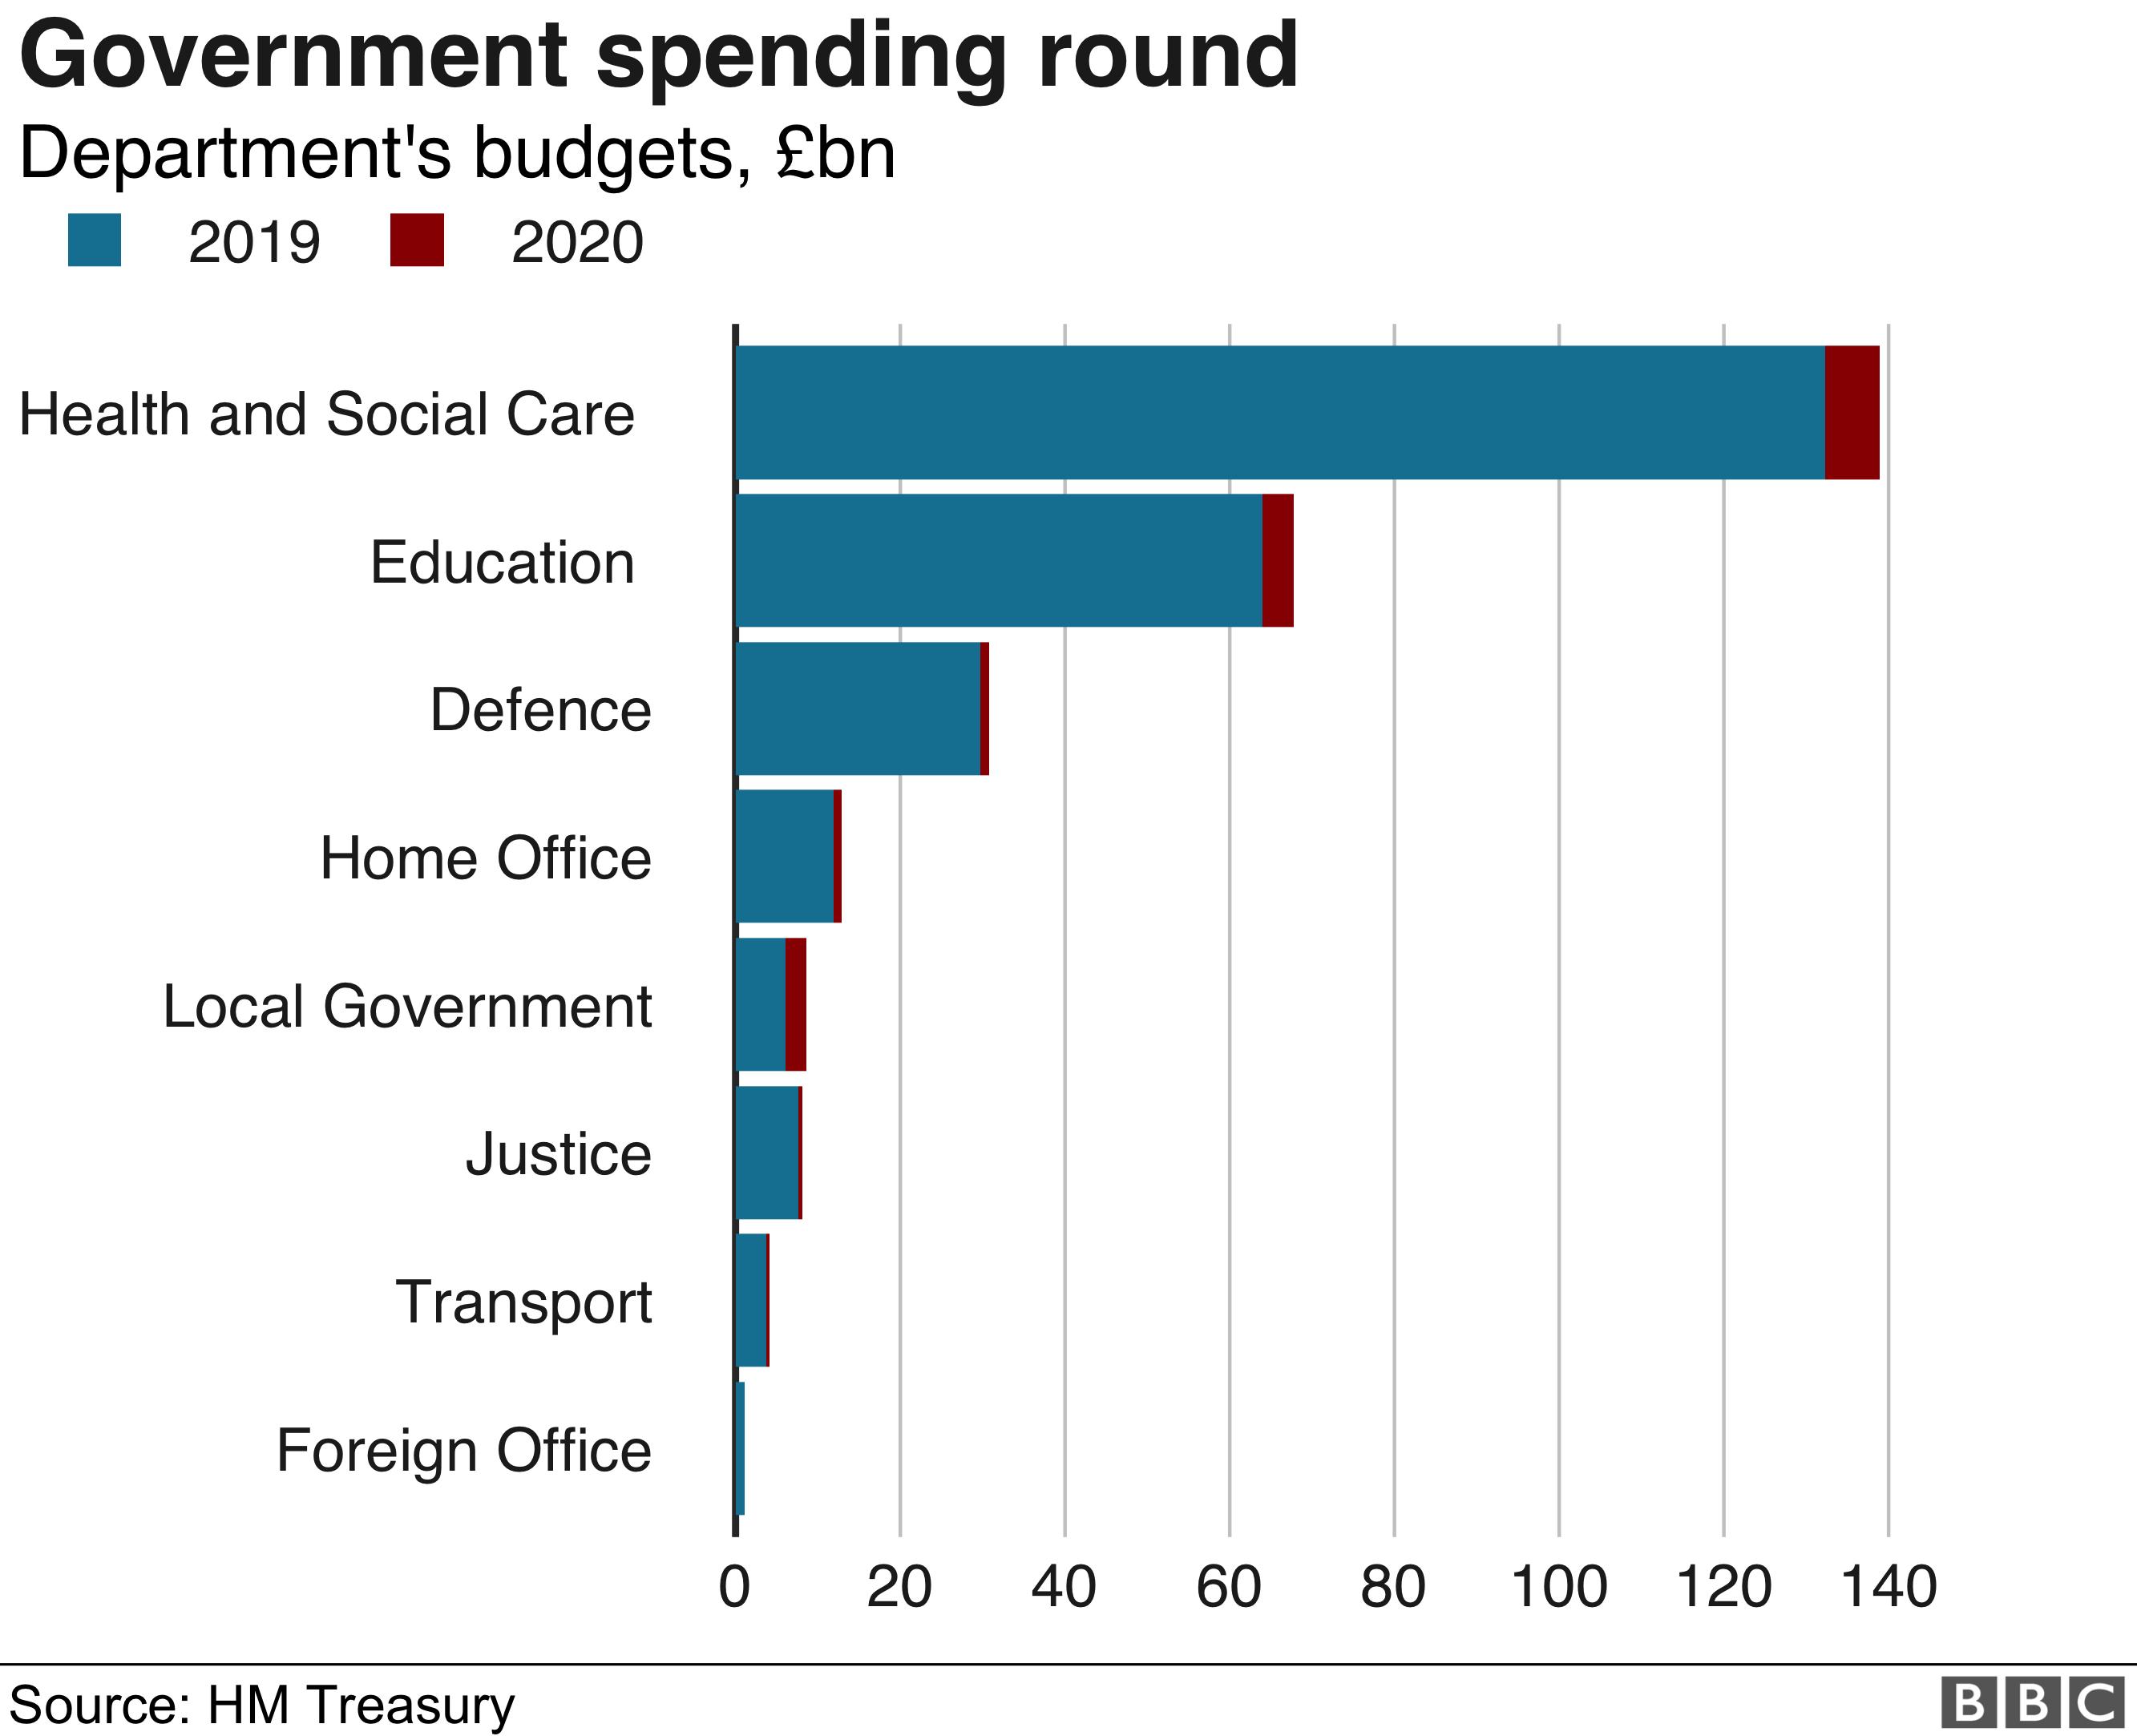 Department spending